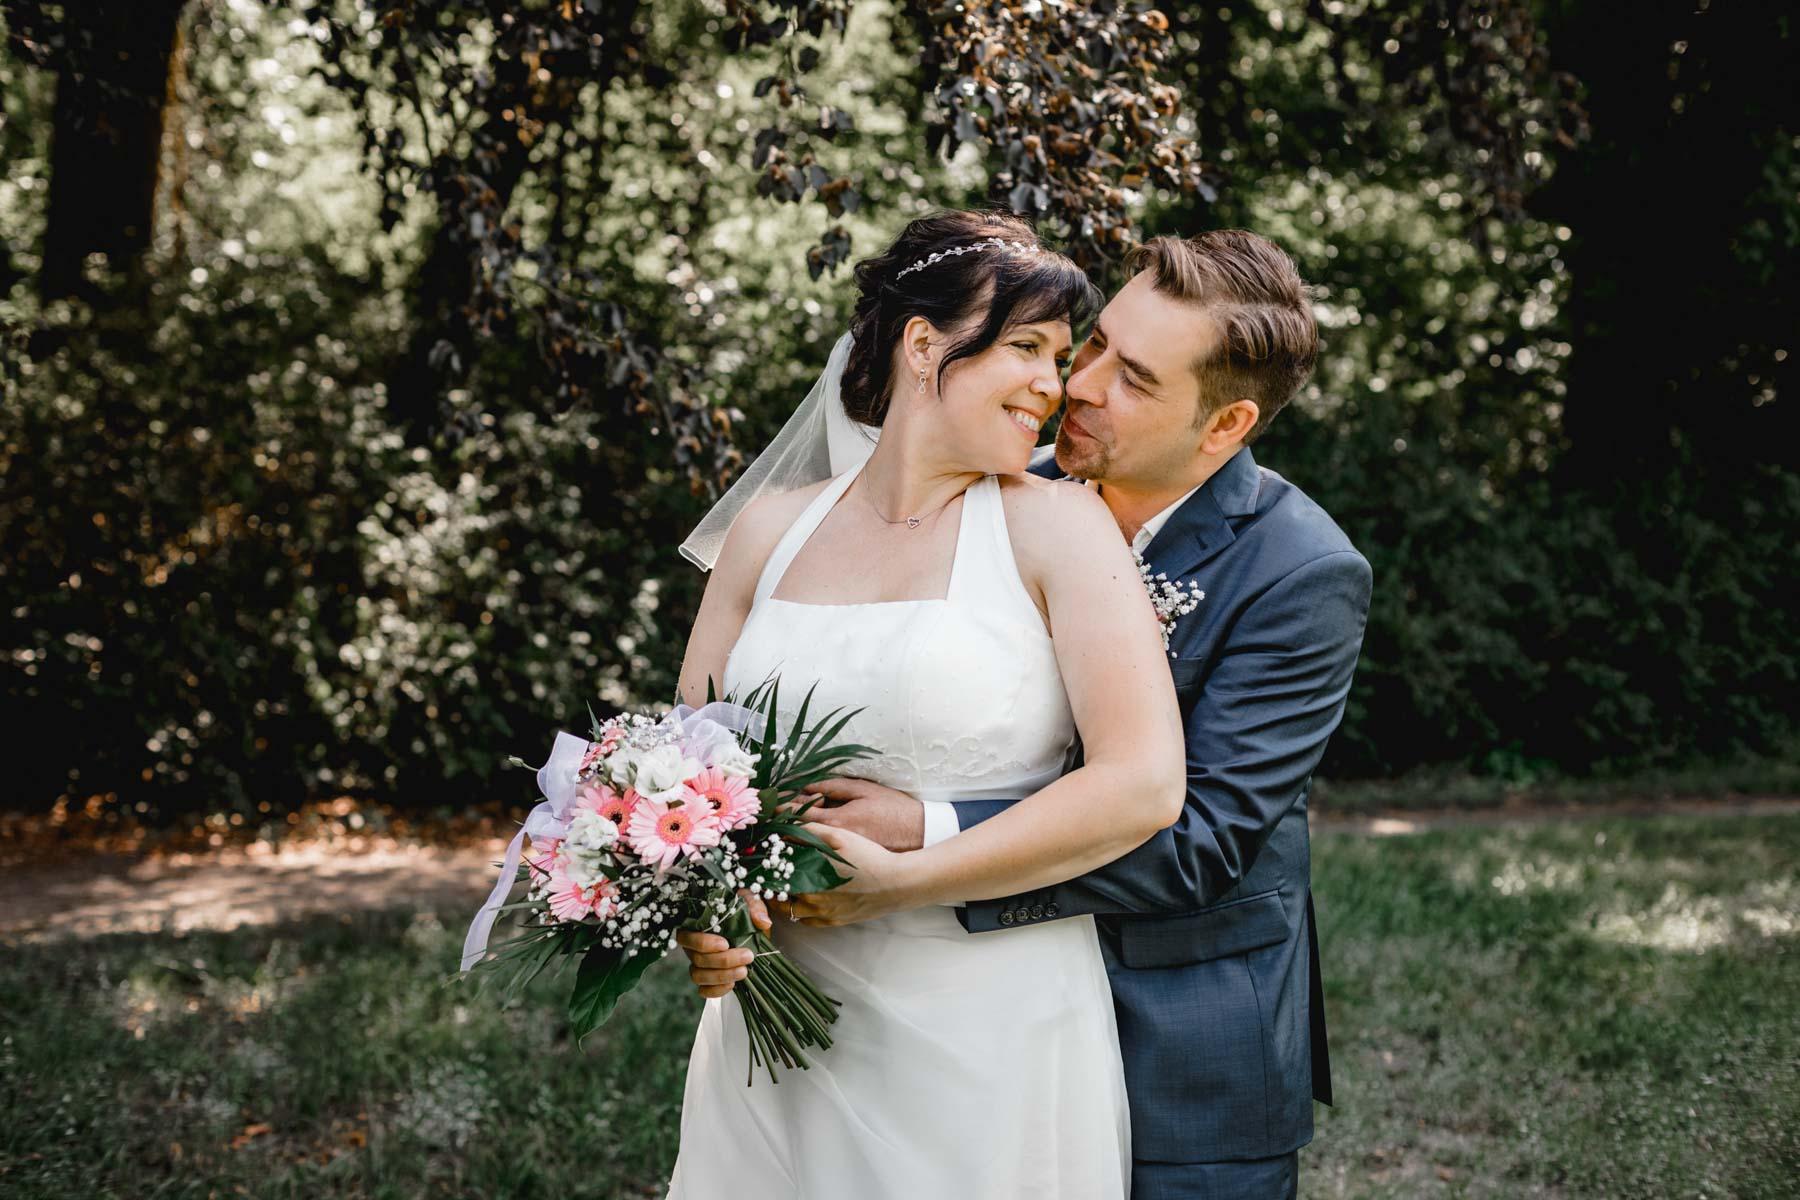 Brautpaar Hochzeitsfotograf Berlin